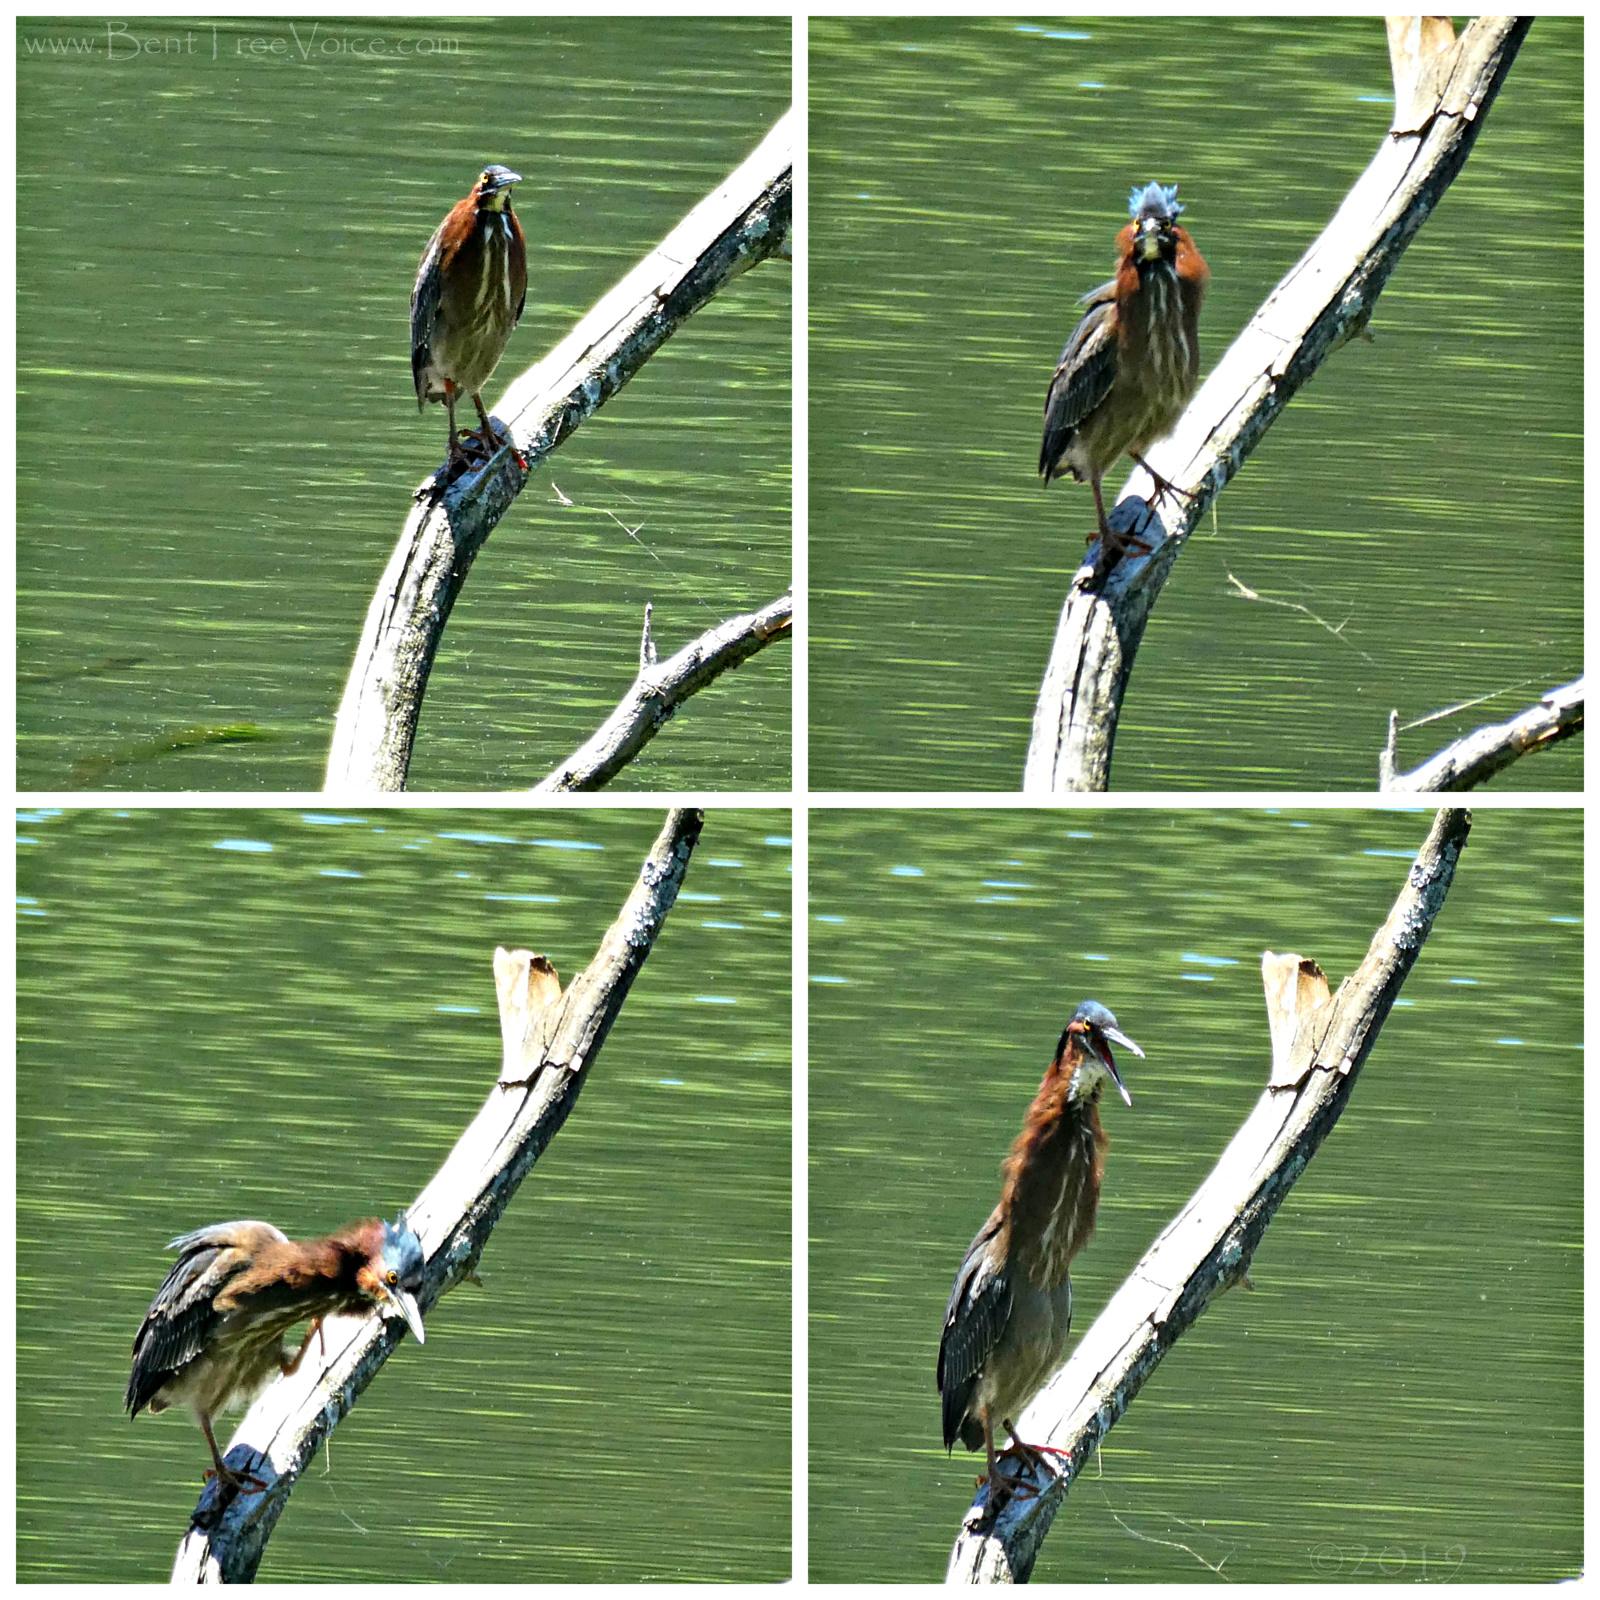 May 14, 2019 - Green Heron in Bent Tree